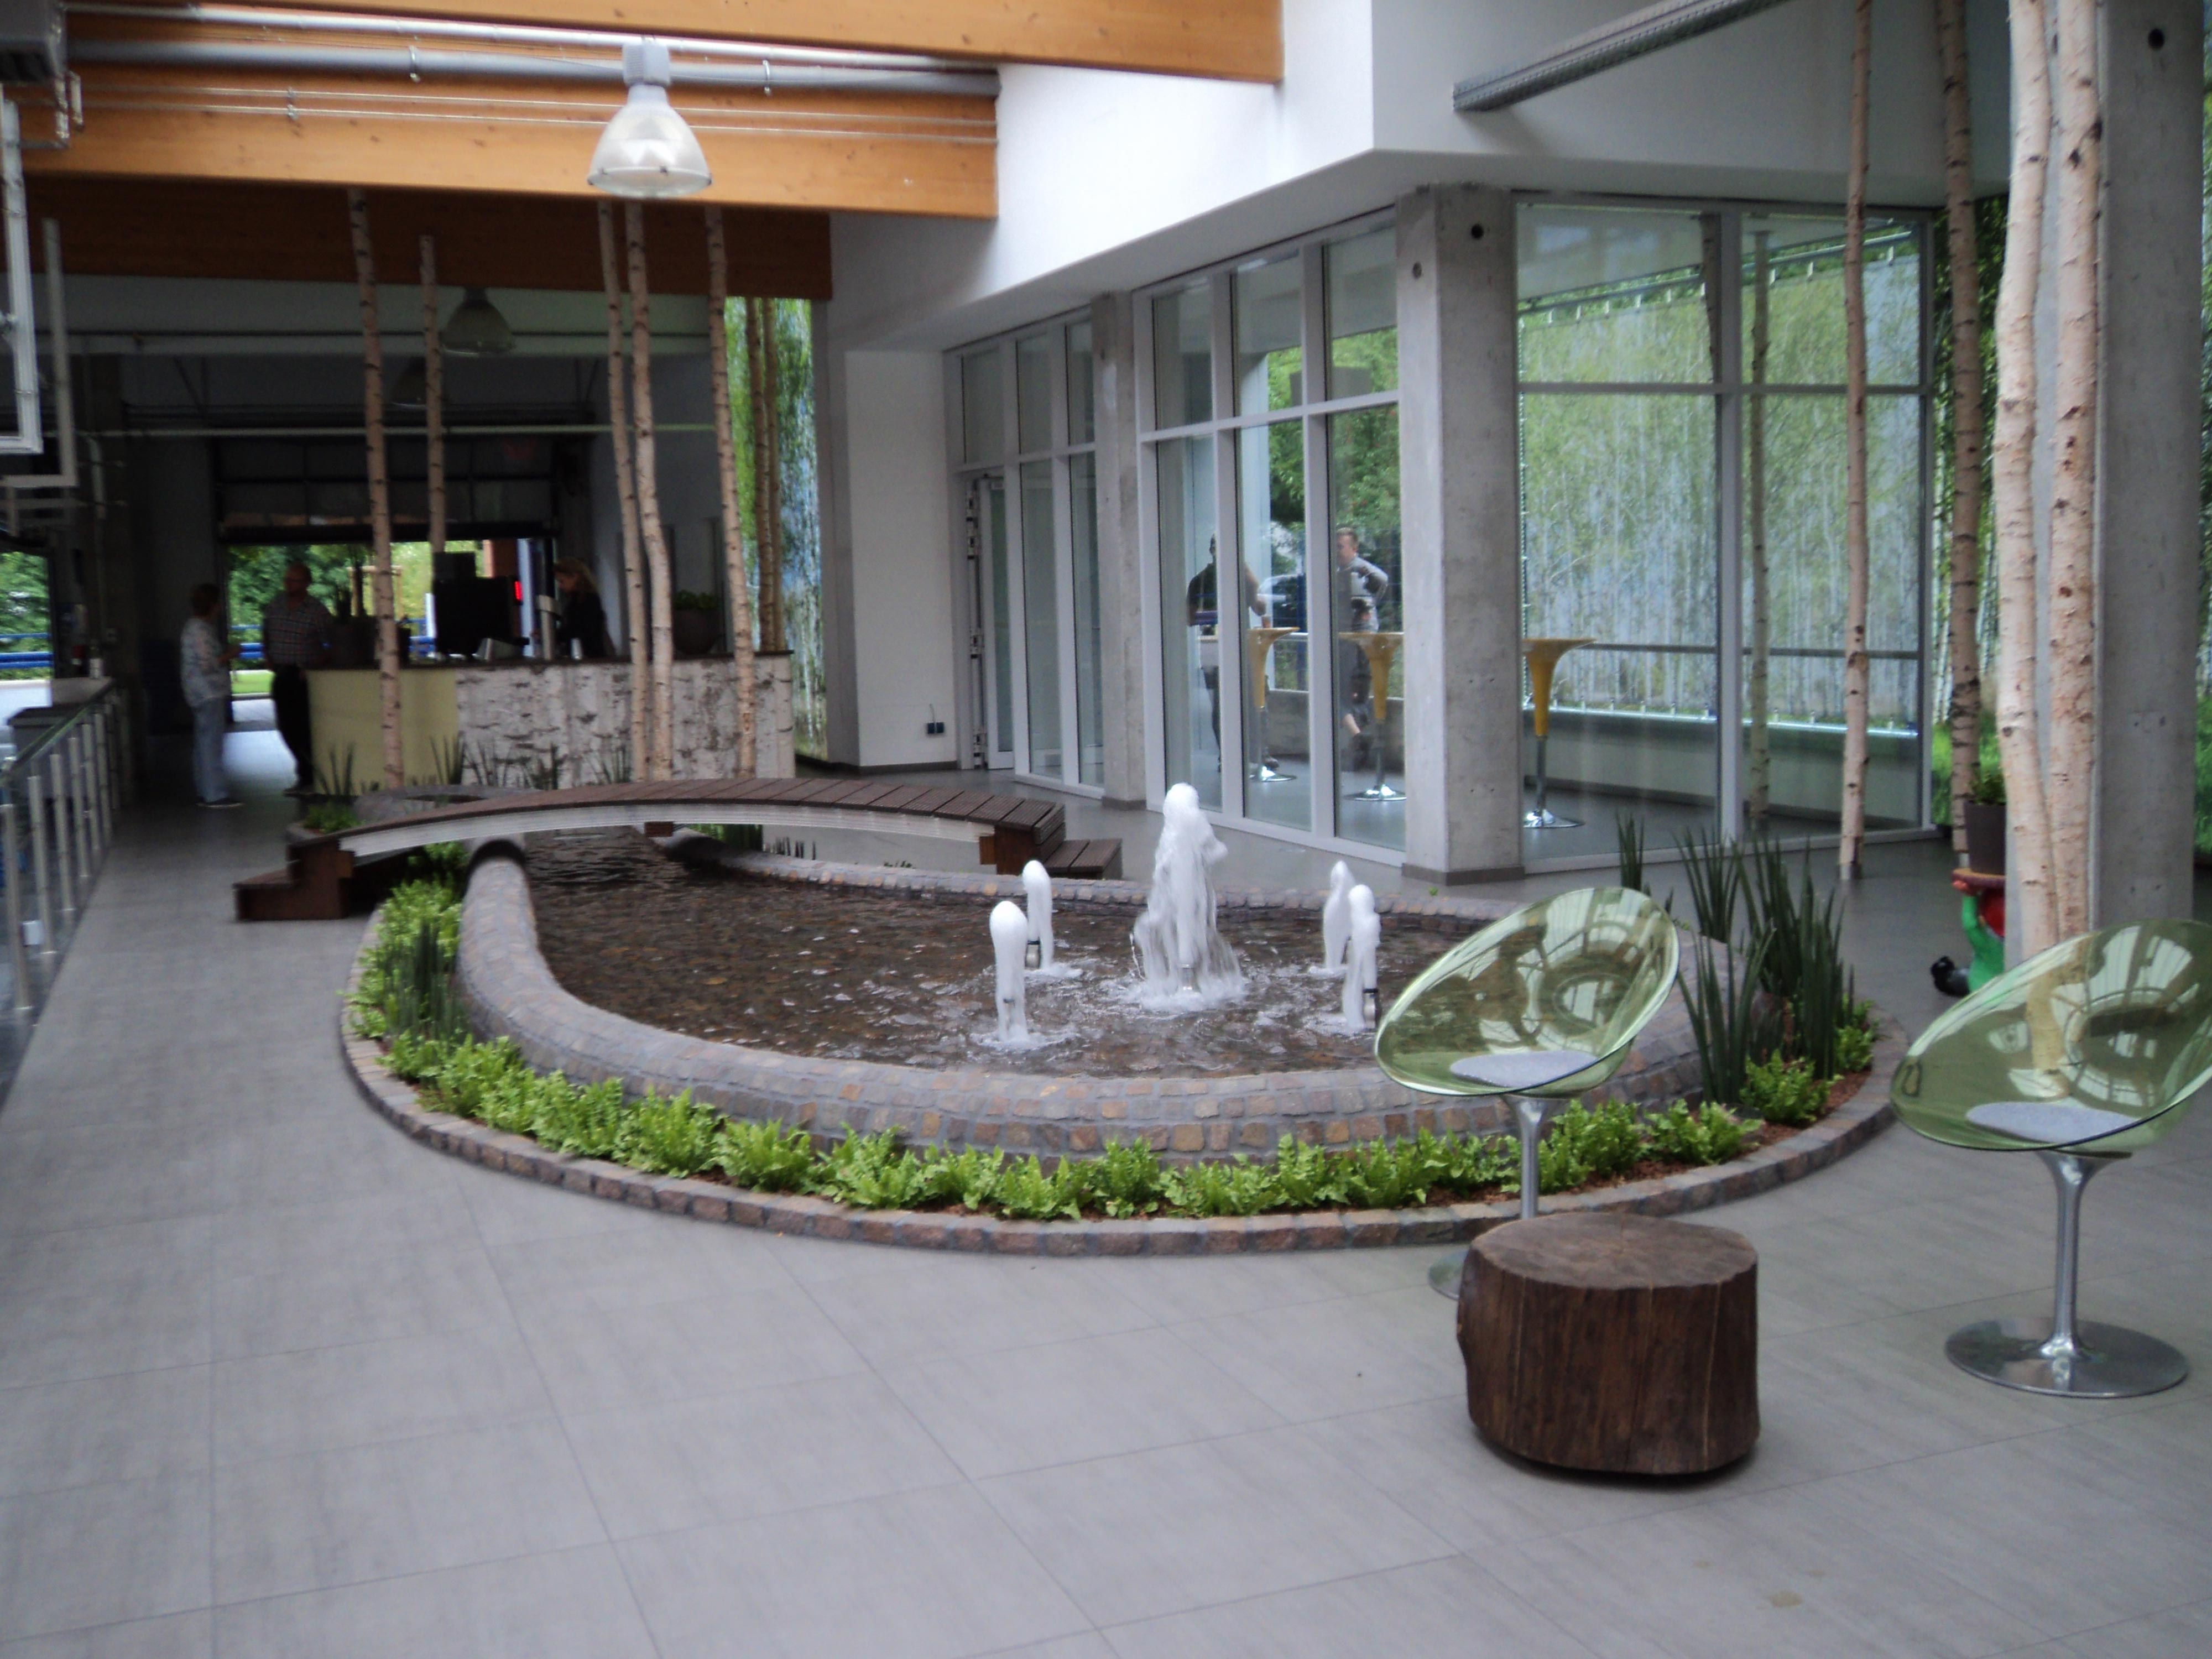 springbrunnenbecken01_web.jpg